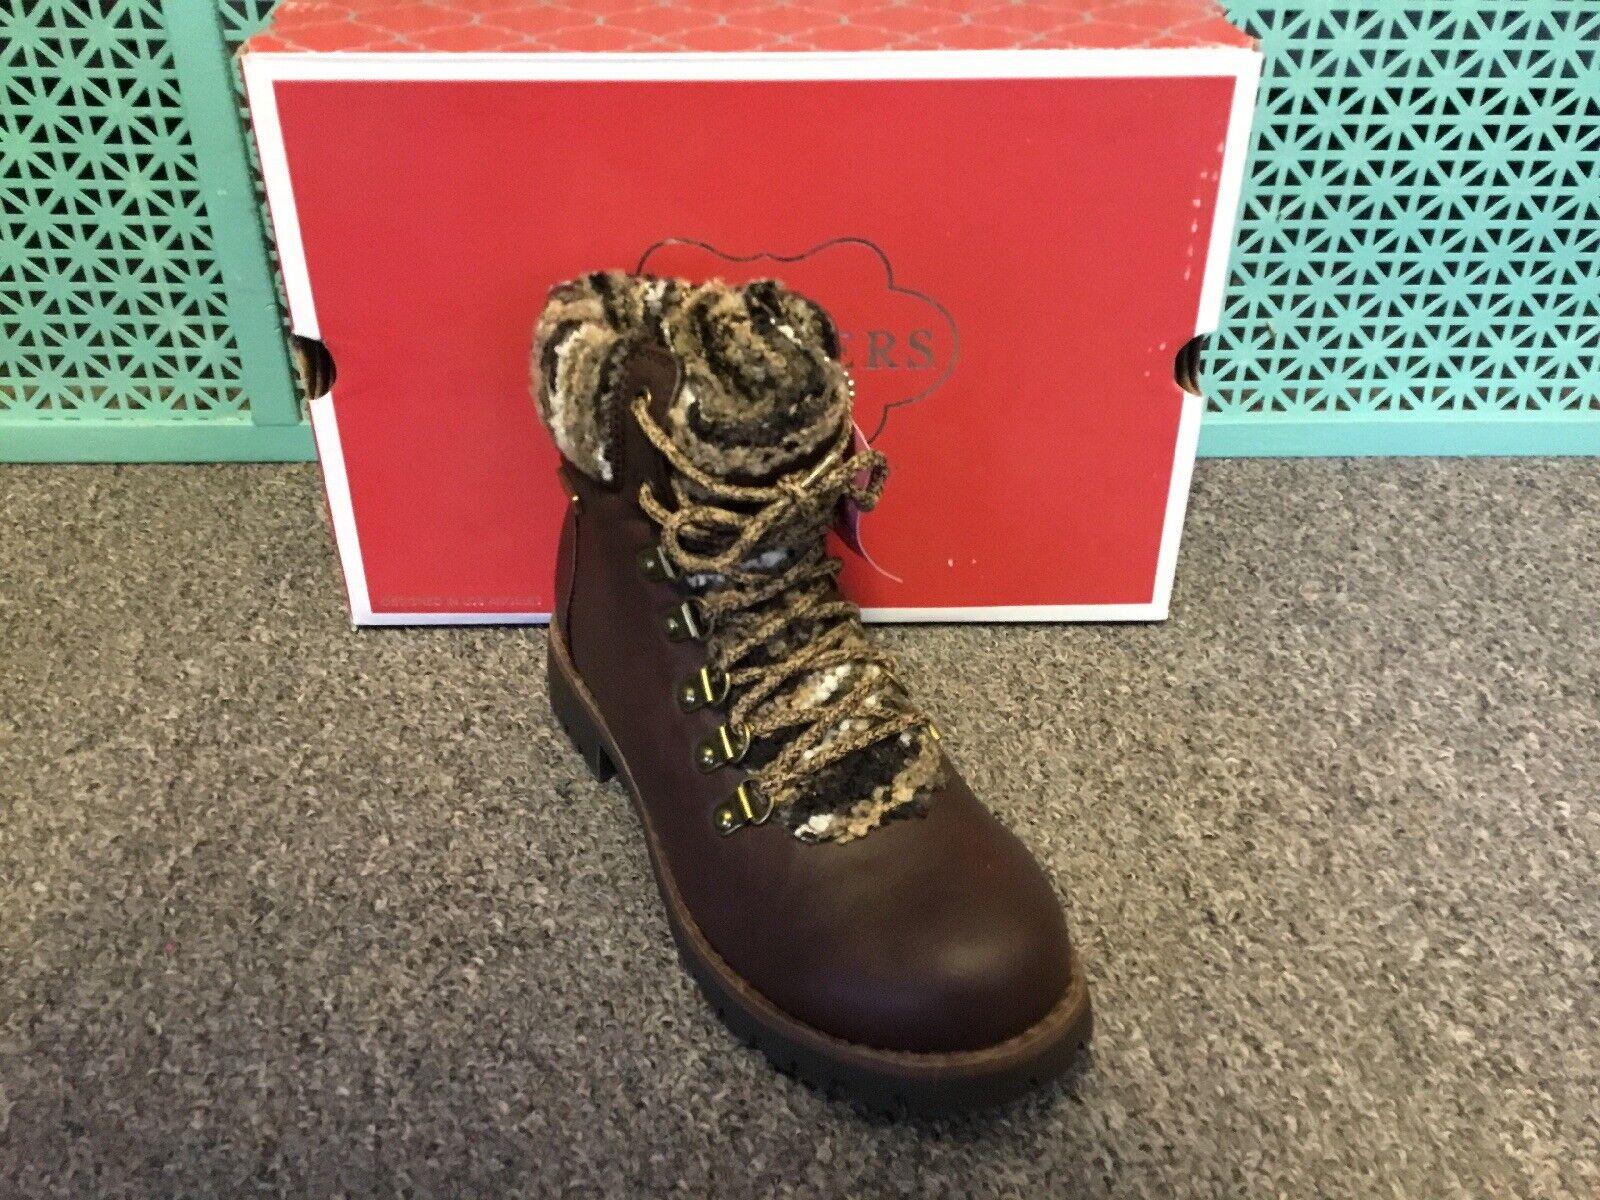 Femmes Skechers Cypress bottes marron Taille 5.5 Medium 49949